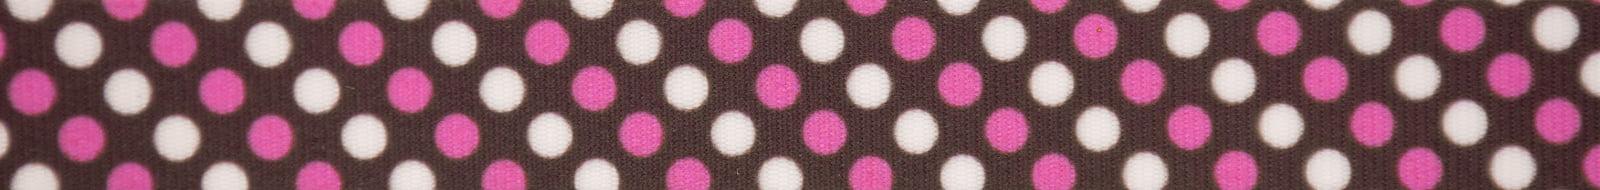 Country Brook Design® Caribbean Twilight Grosgrain Ribbon